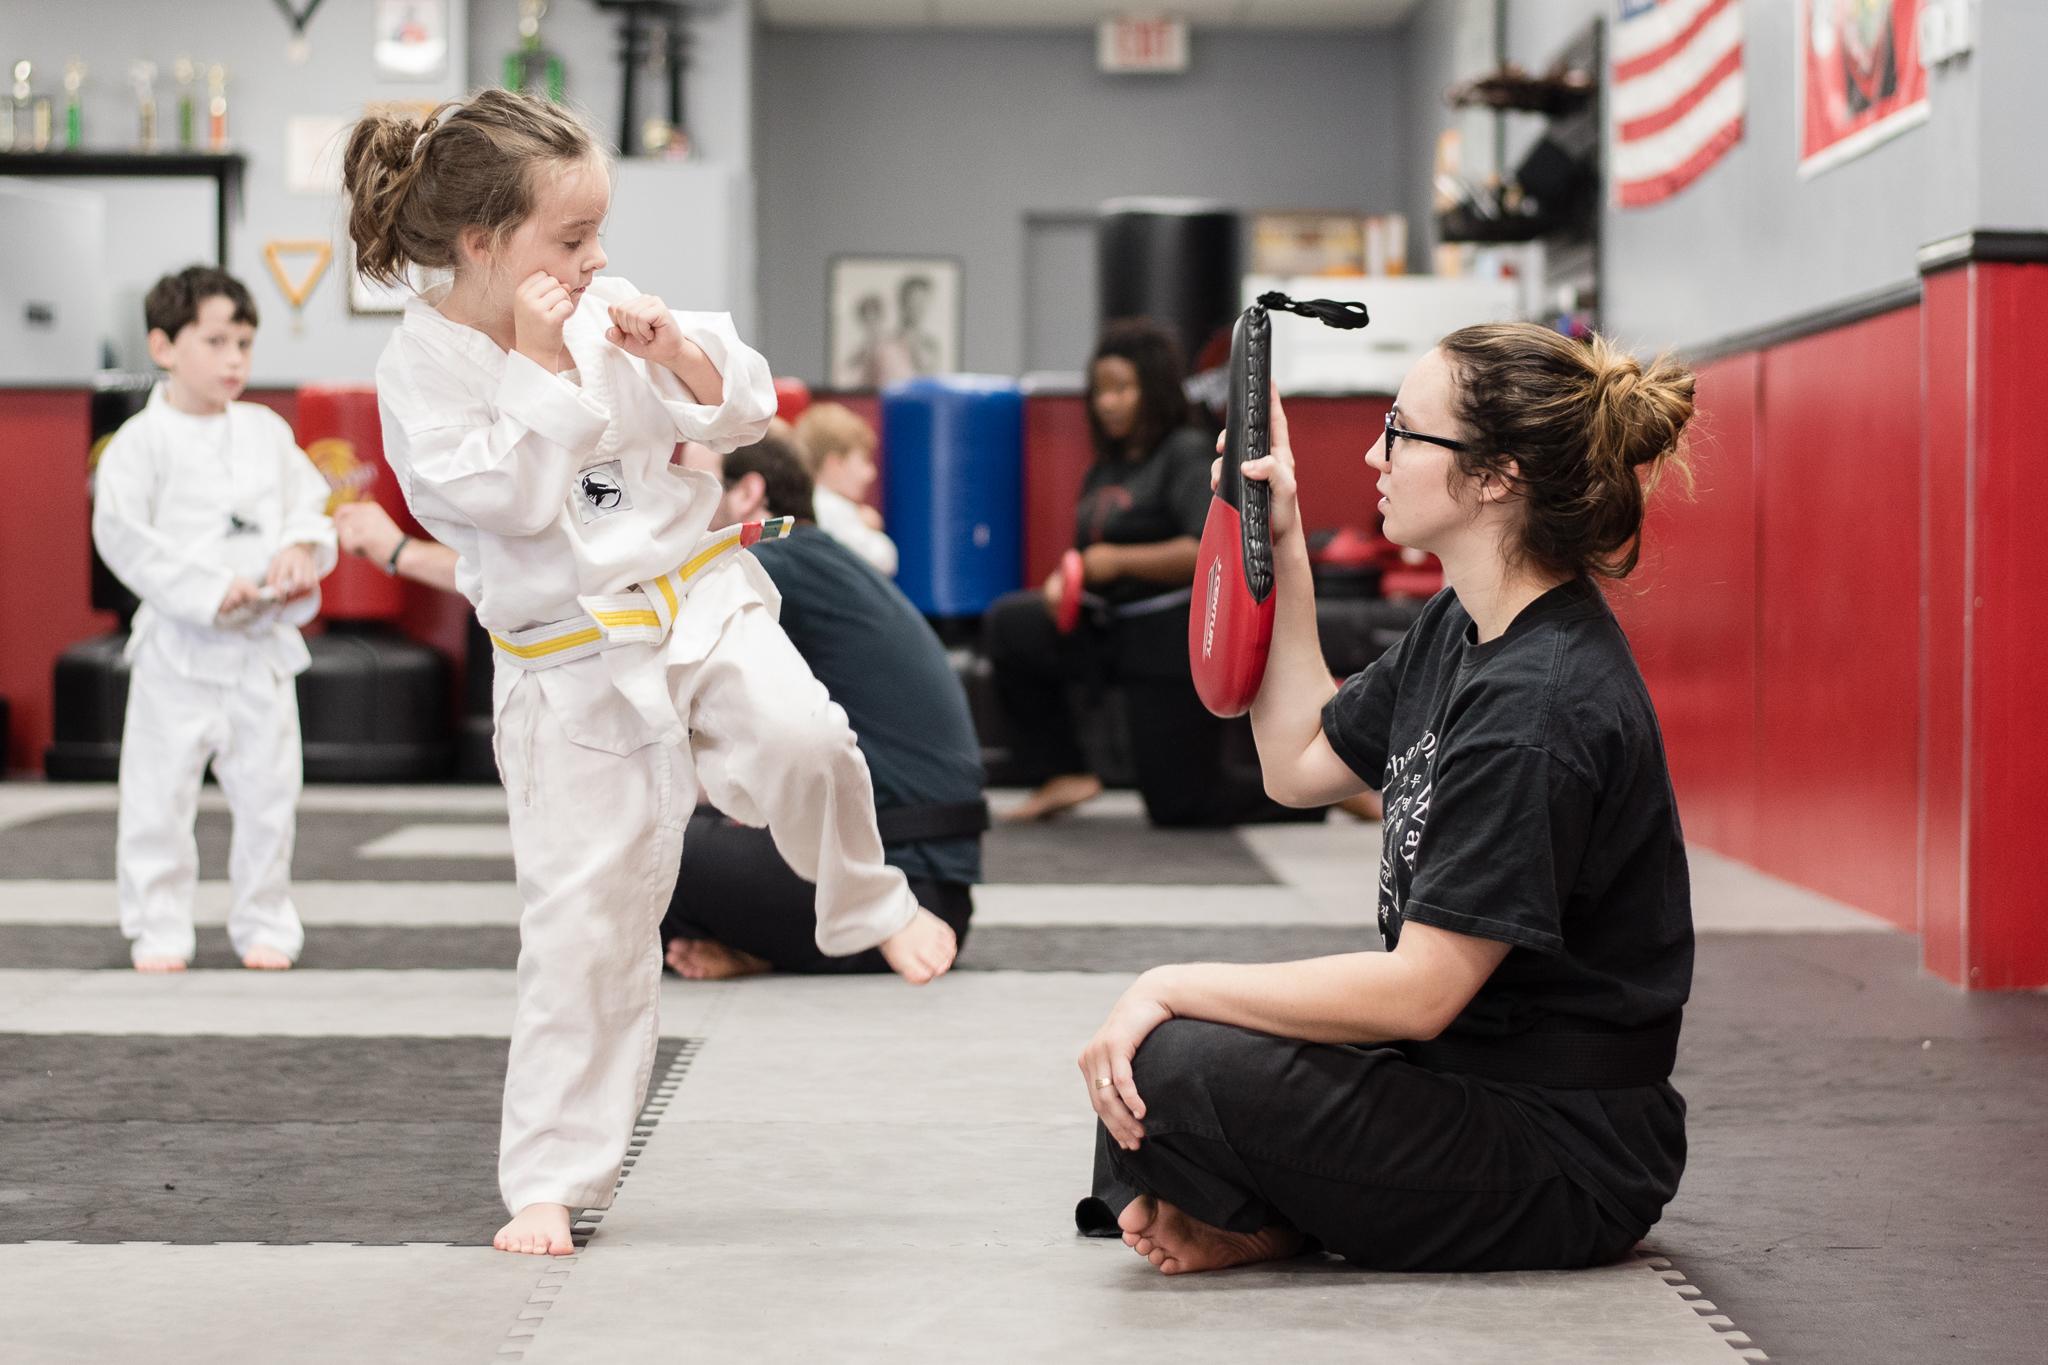 Austin and Round Rock Commercial Photography - Emily Ingalls Photography - Sports and Fitness Photography - Martial Arts Taekwondo Kajukenbo Photography-4.jpg